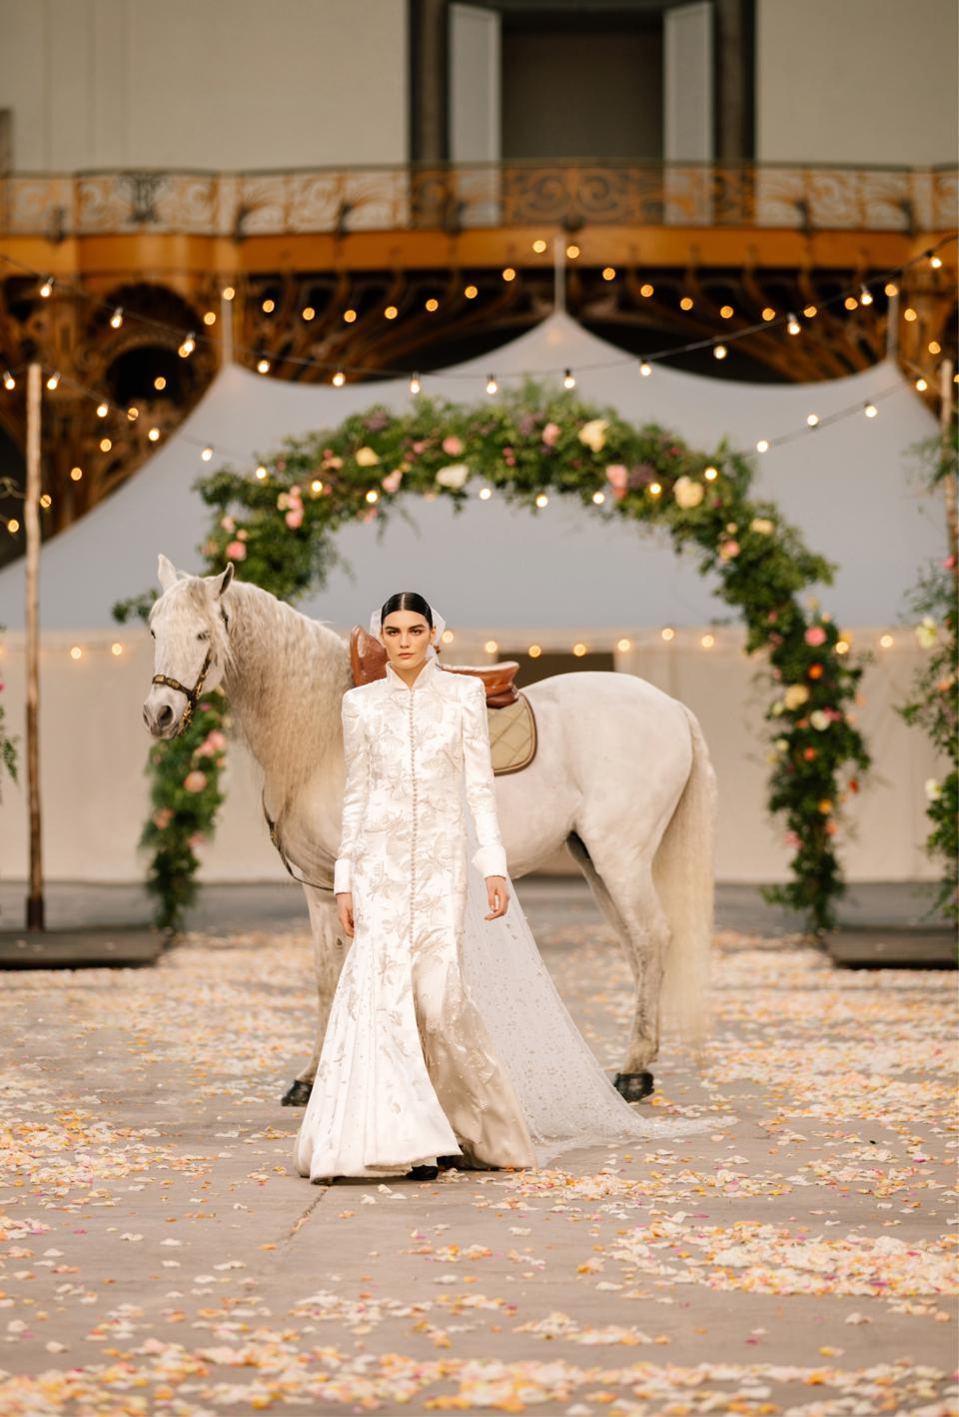 Lola Nicon, the CHANEL bride on a white horse